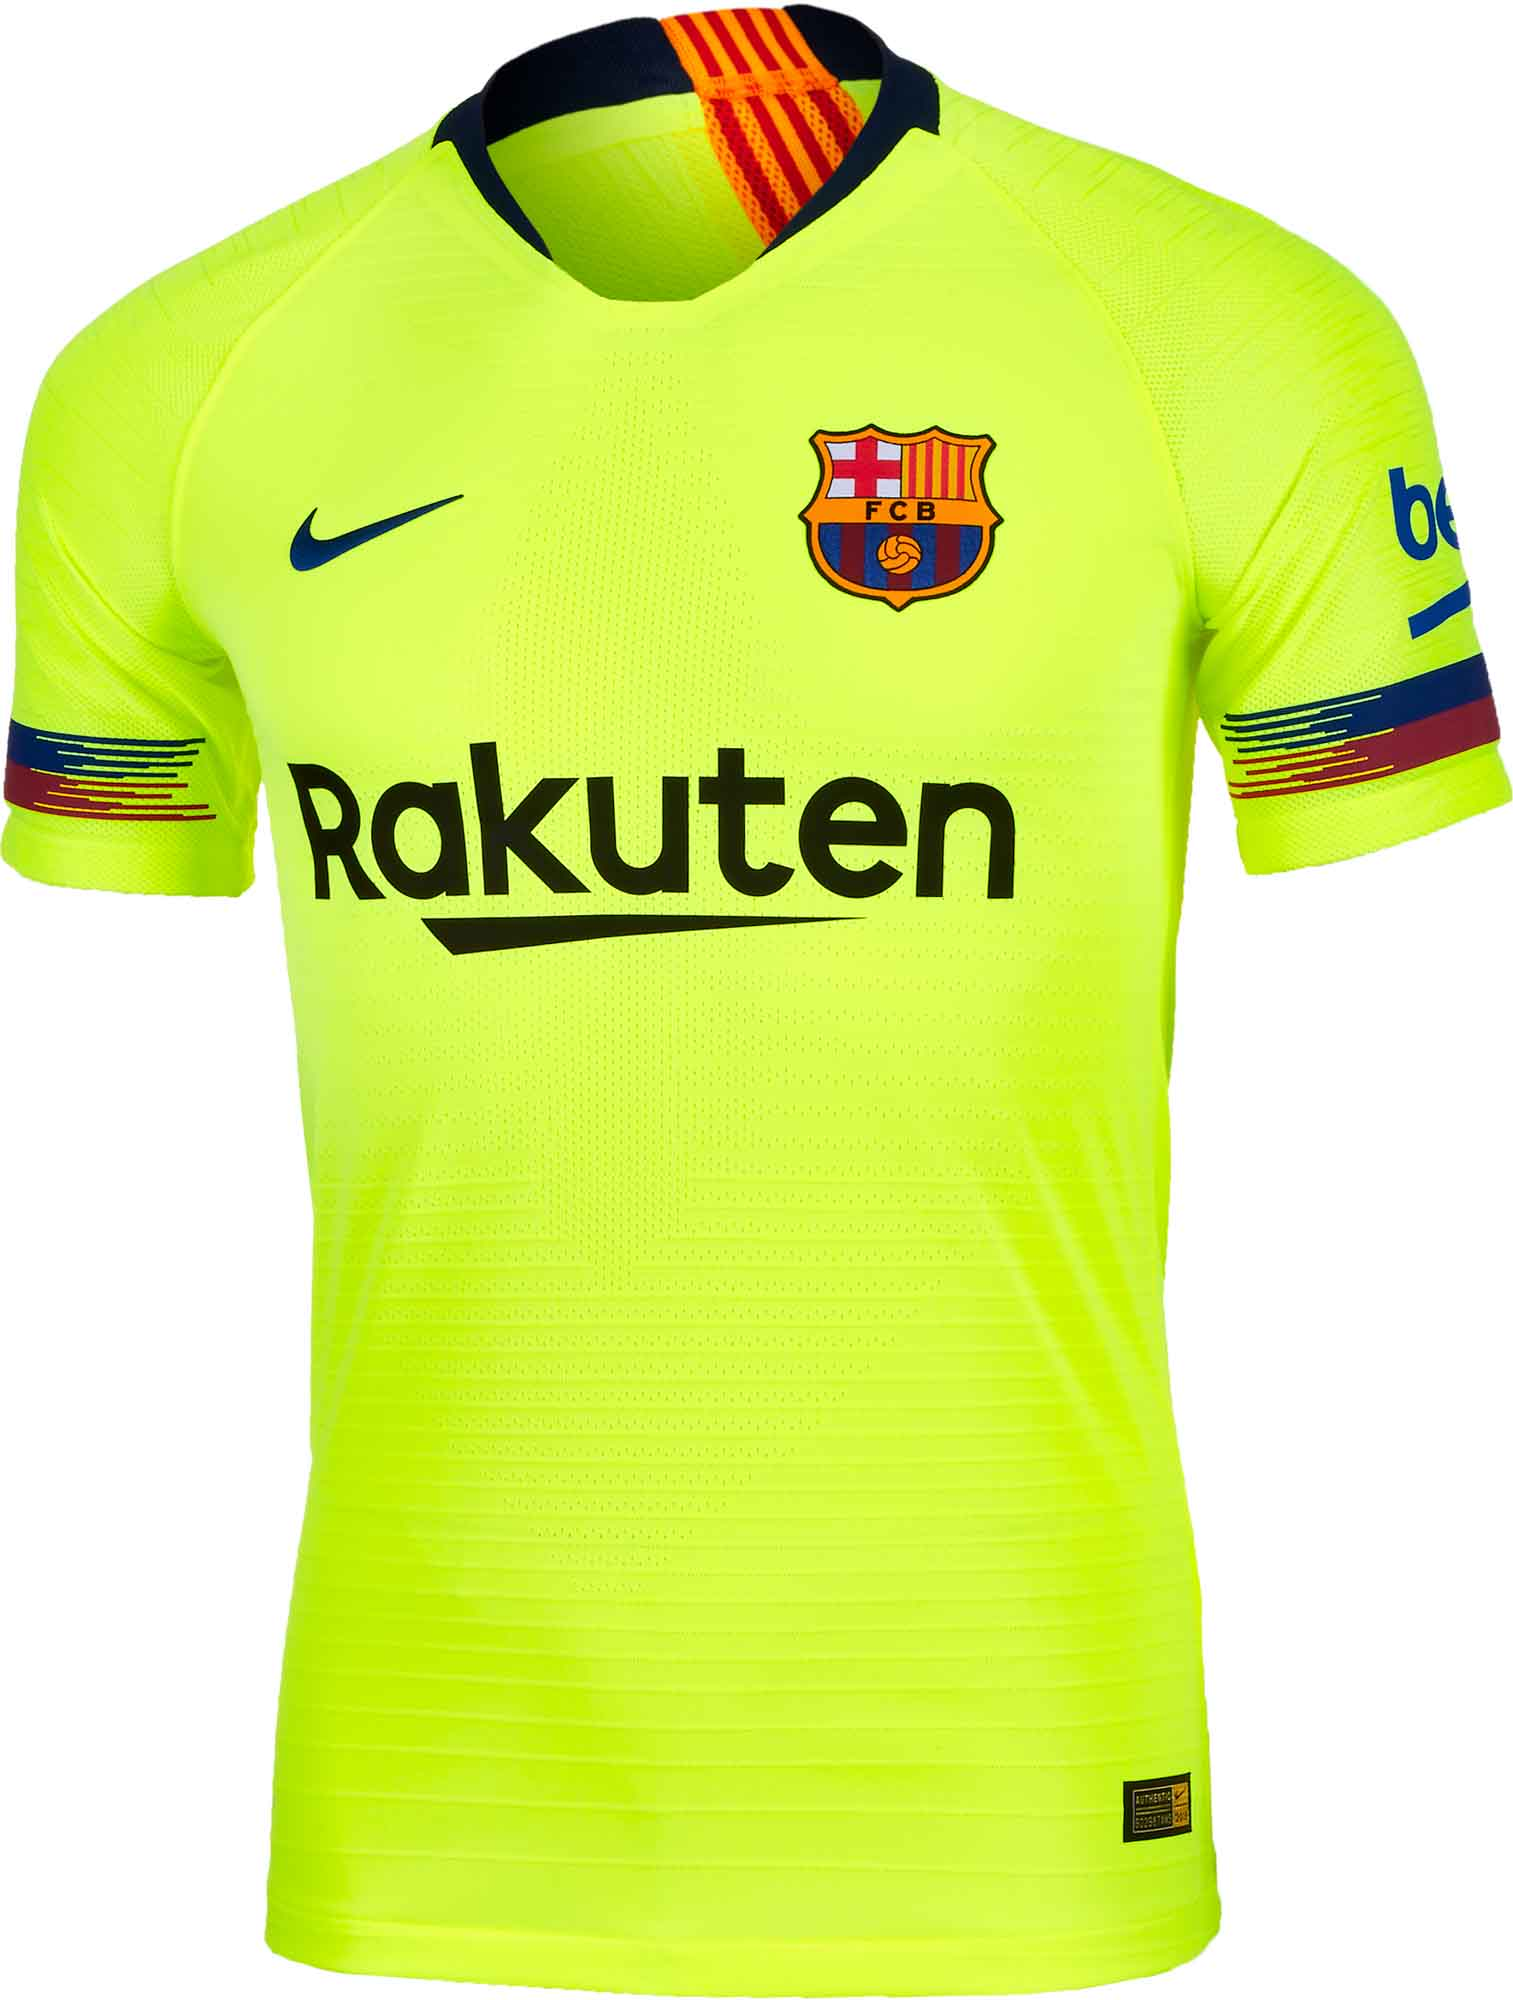 e1530d3894c 2018 19 Nike Barcelona Away Match Jersey - SoccerPro